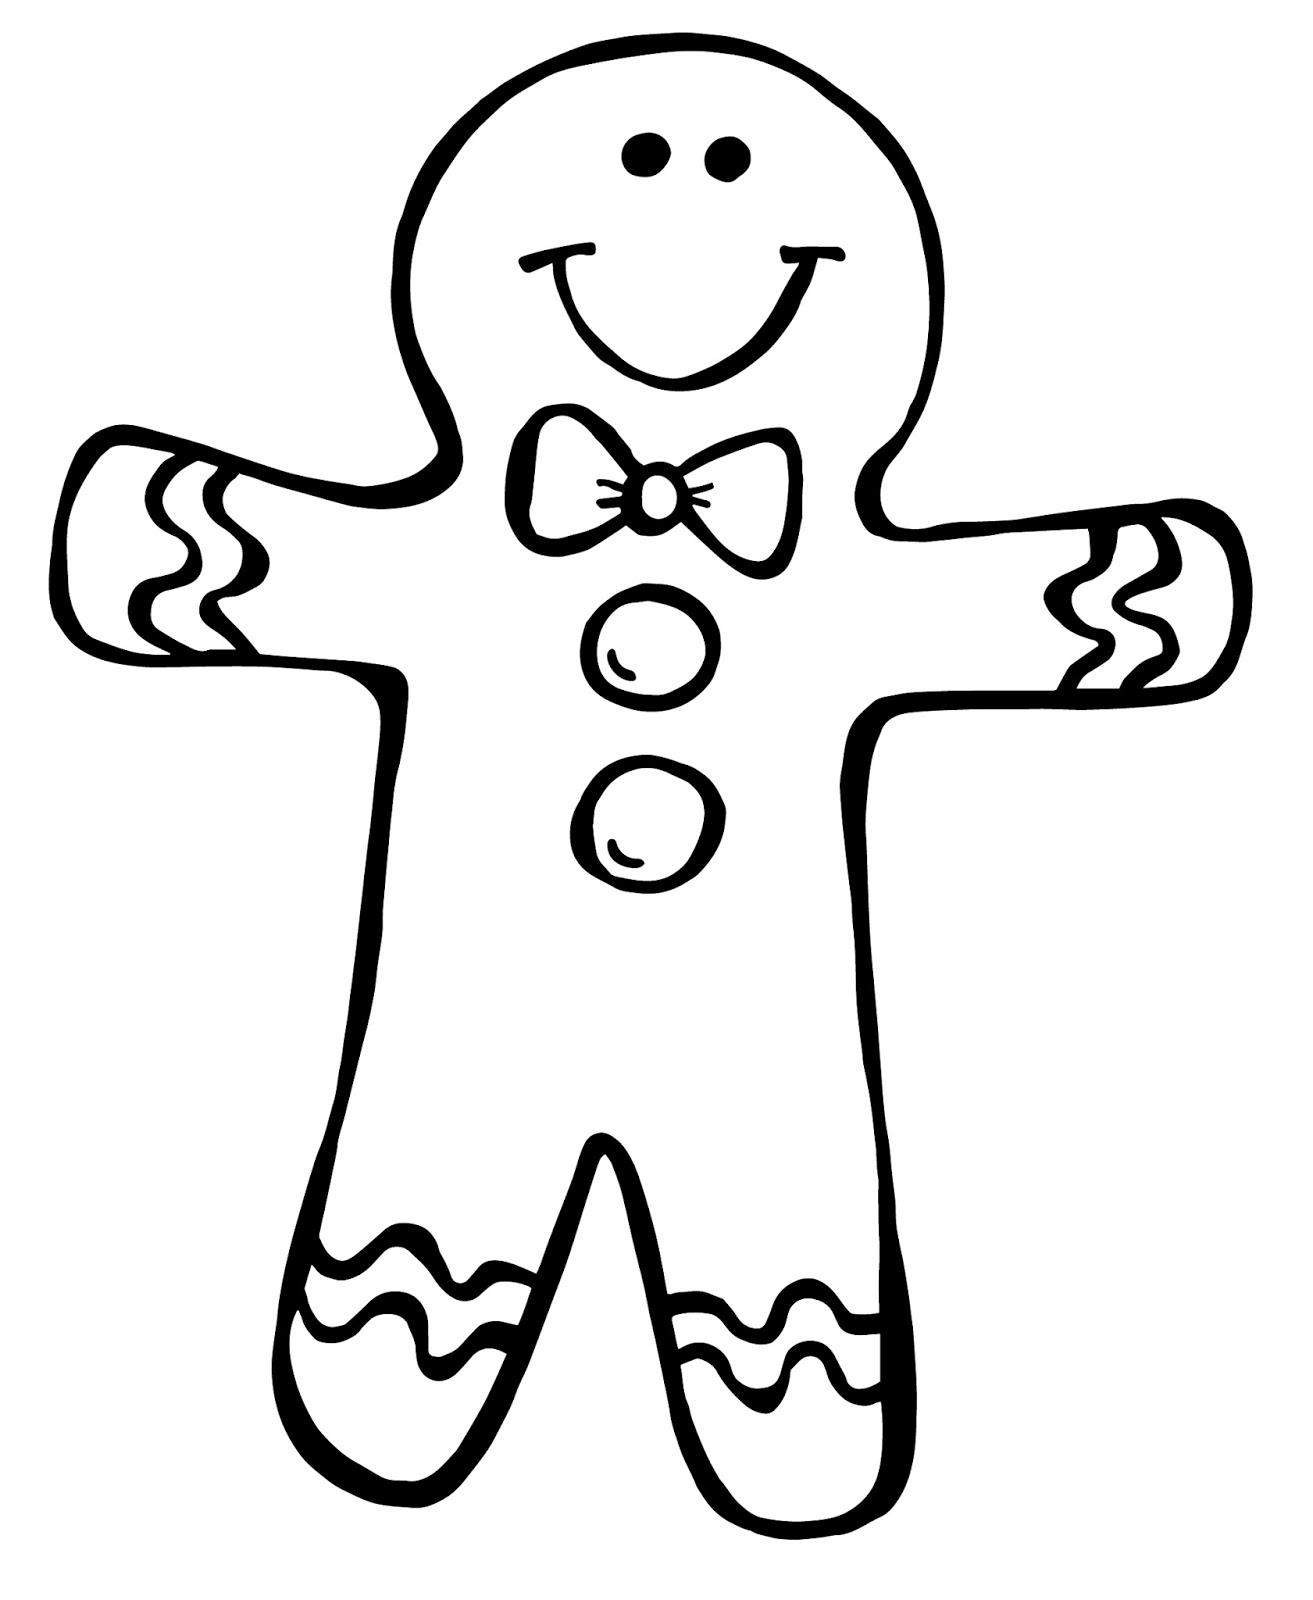 Gingerbread man 0 images about clip art gingerbread men on natal.